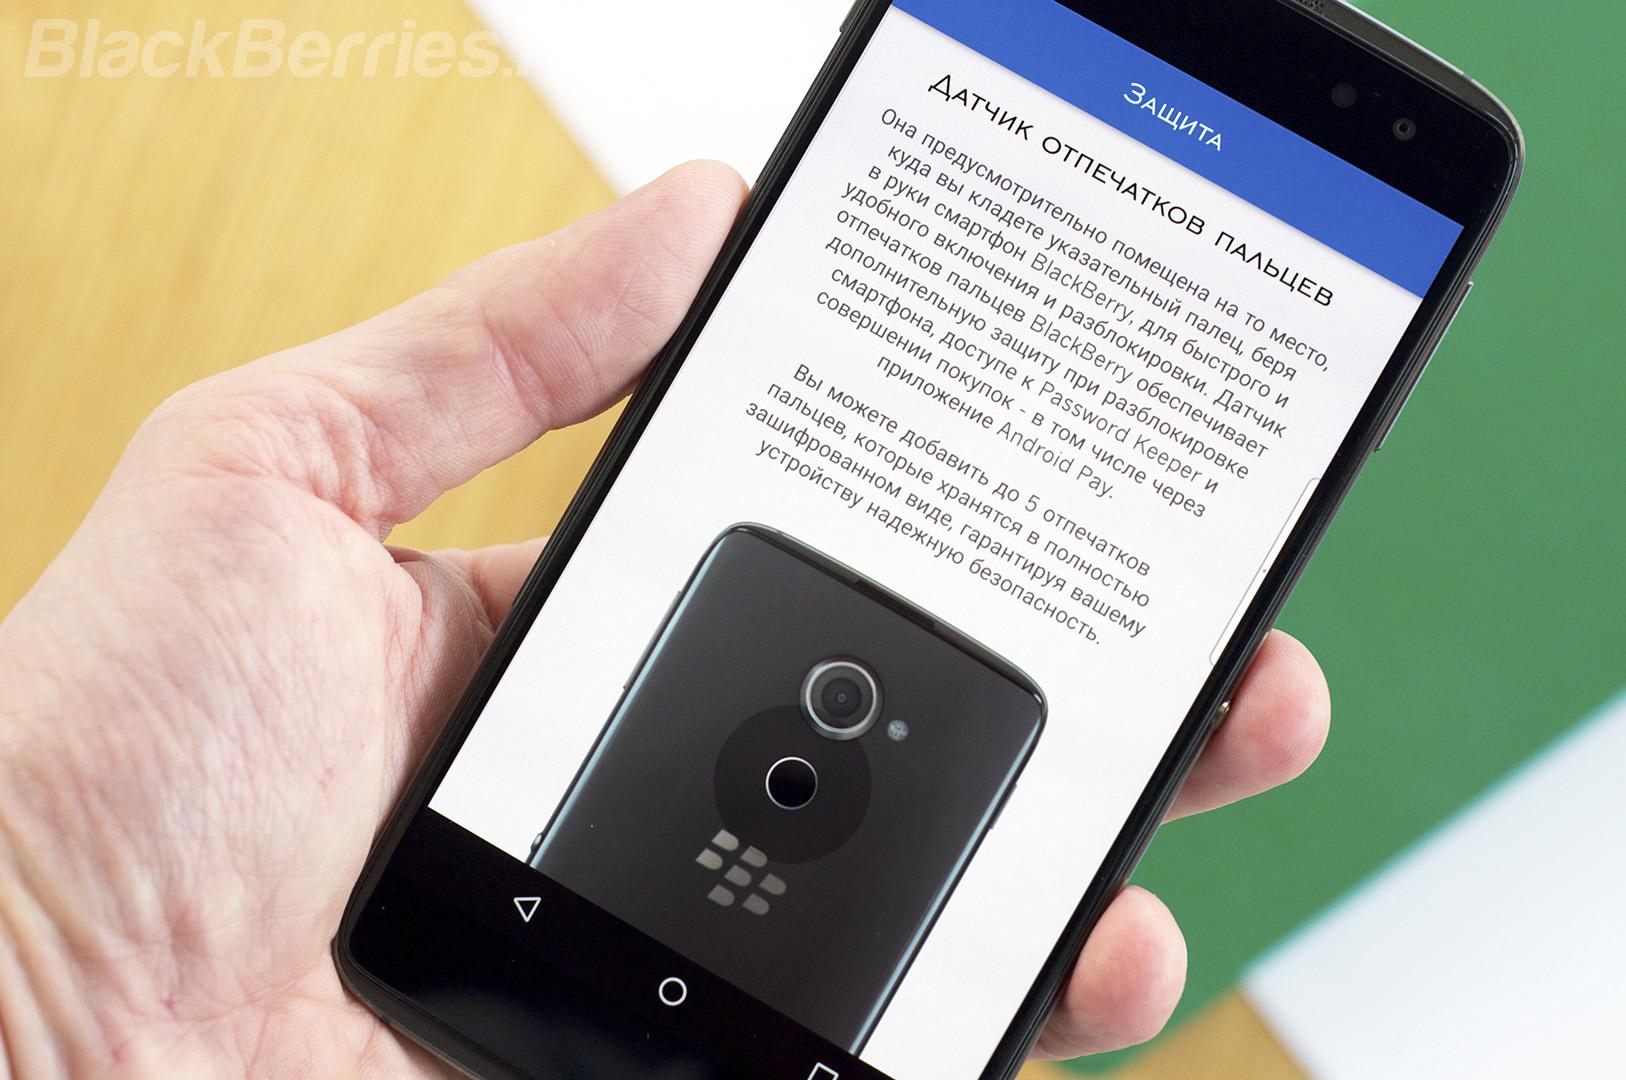 blackberry-dtek60-review-2-17